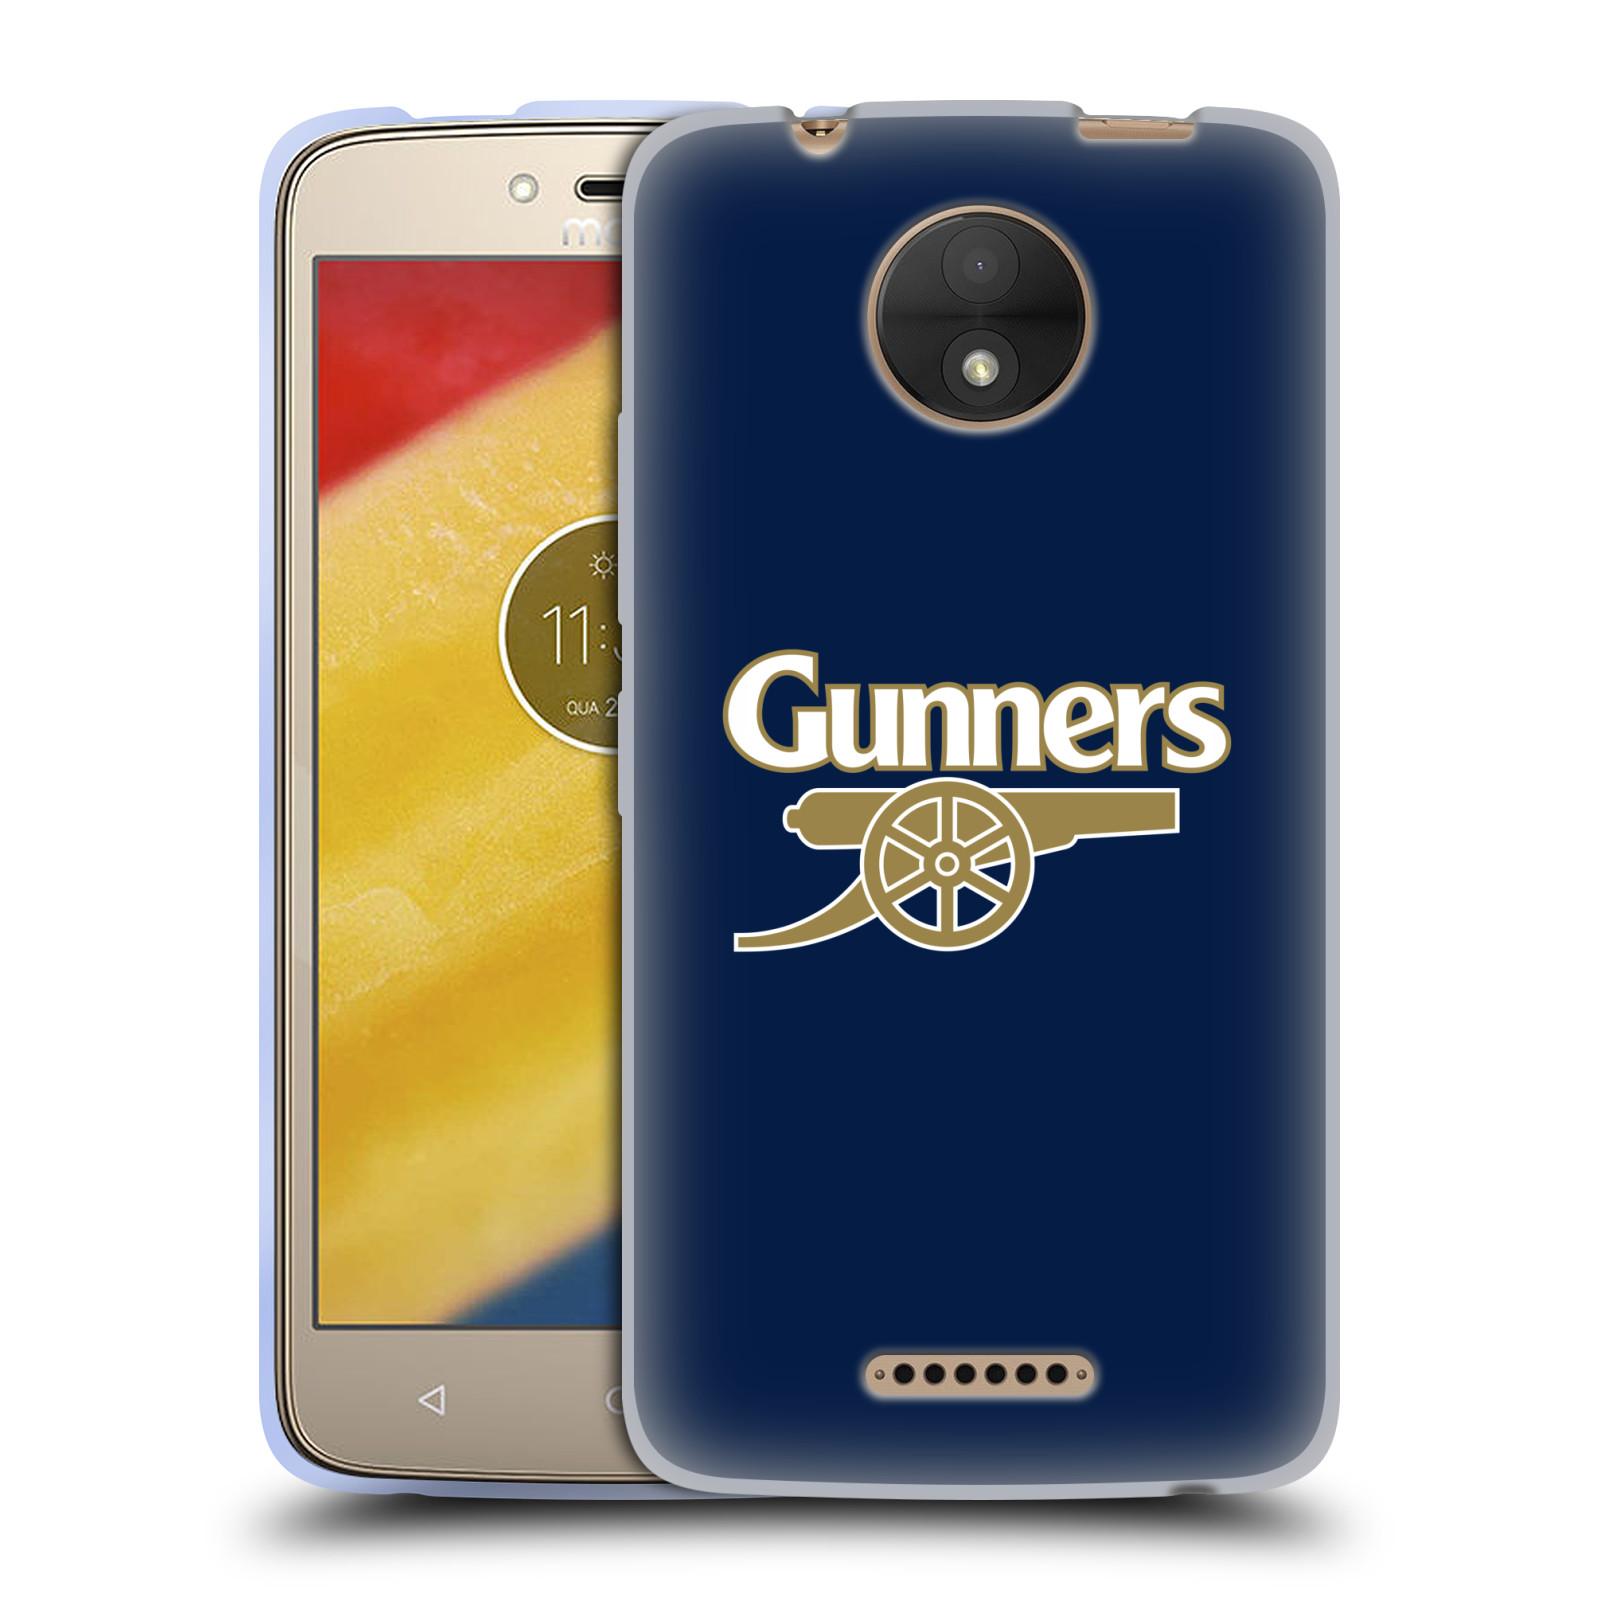 Silikonové pouzdro na mobil Lenovo Moto C - Head Case - Arsenal FC - Gunners